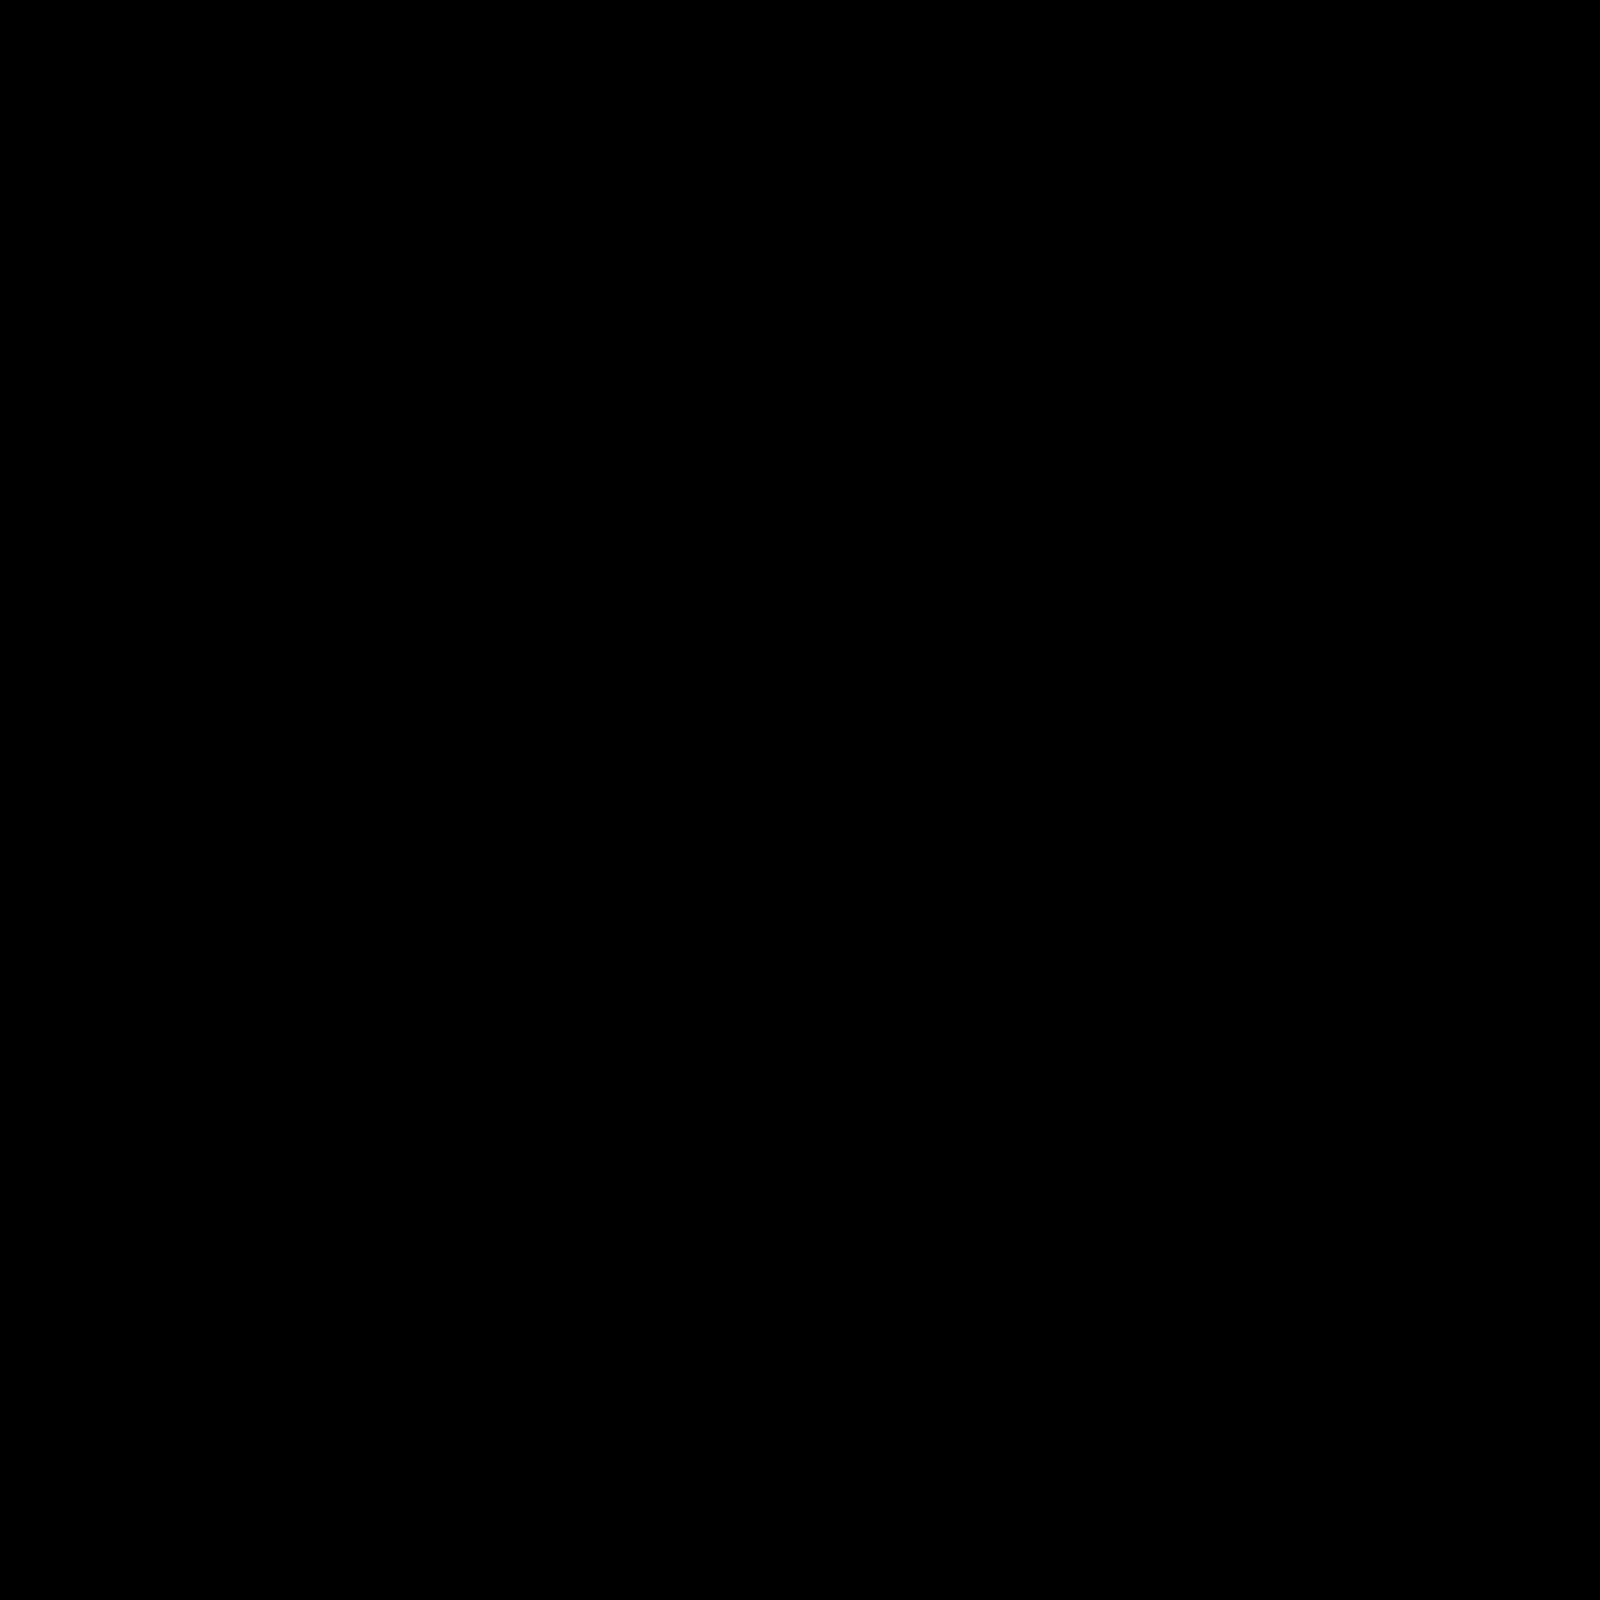 logo-checkmark.png